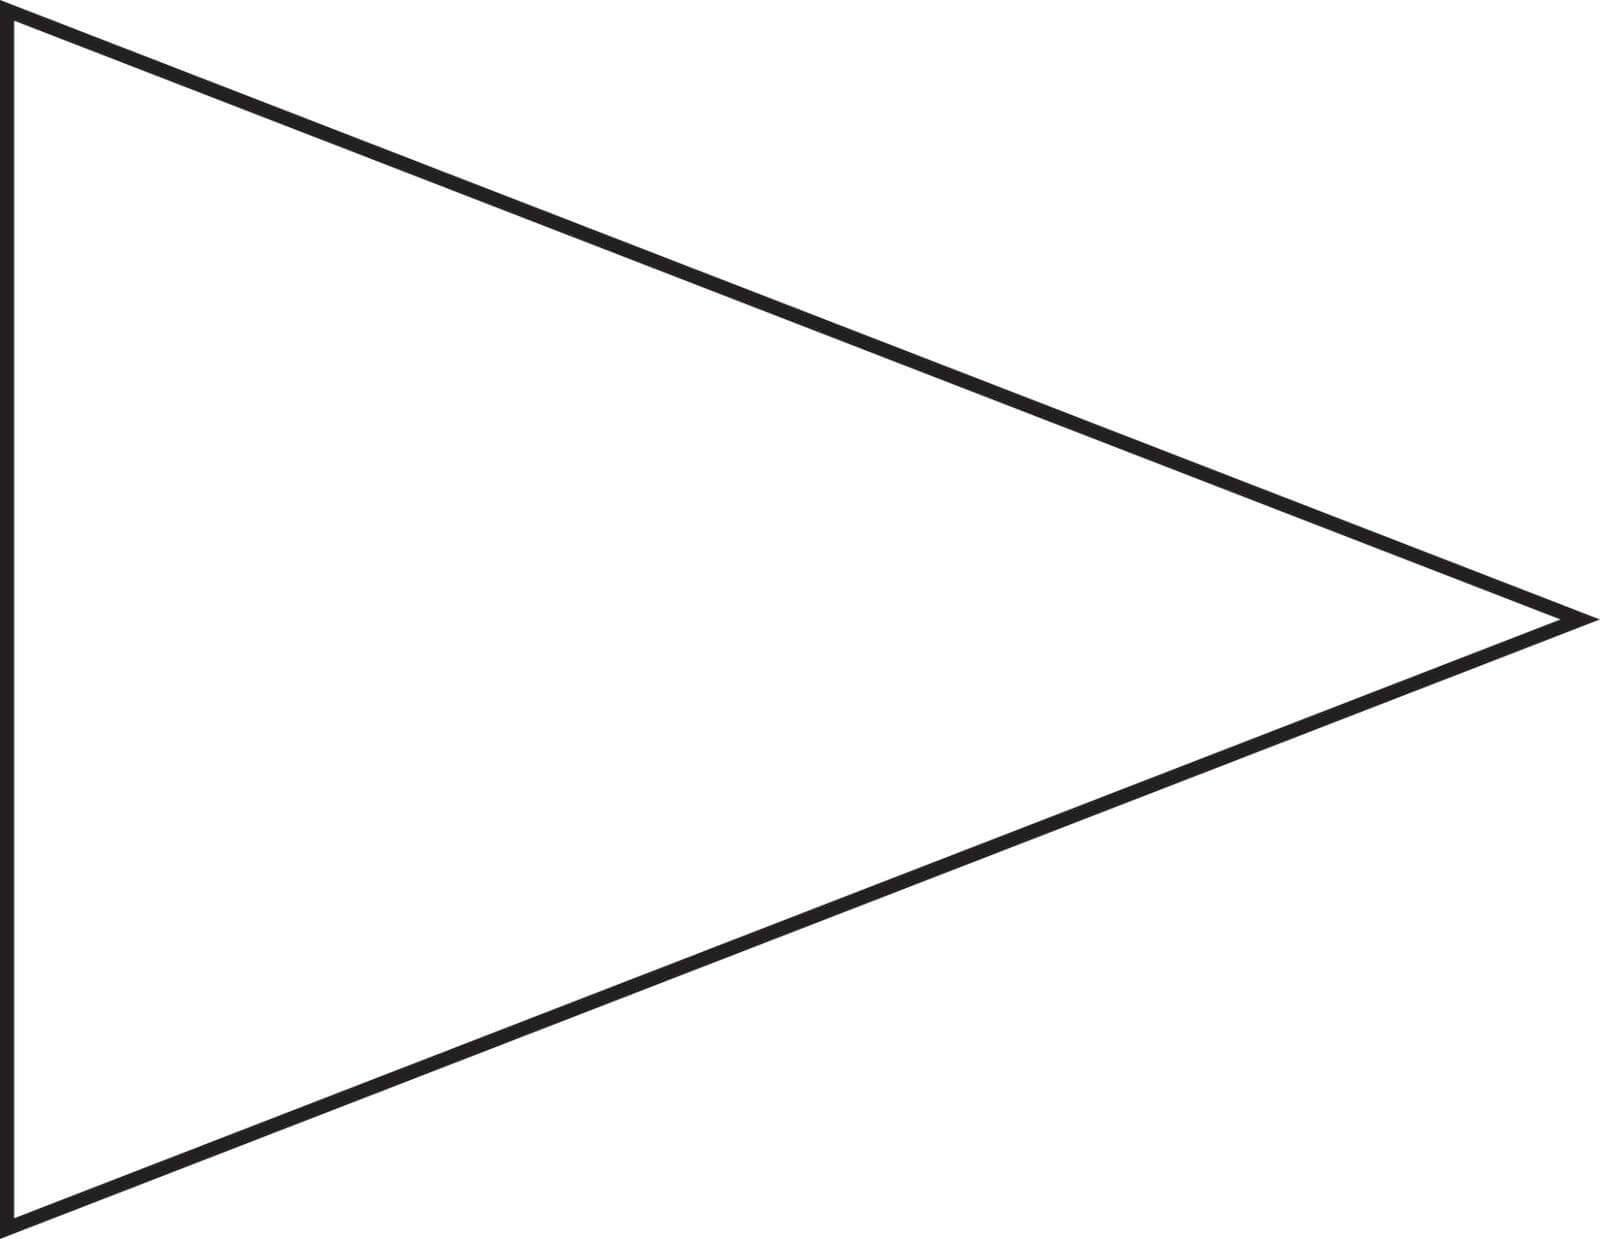 College Pennant Template Free – Invitation Templates With Printable Pennant Banner Template Free